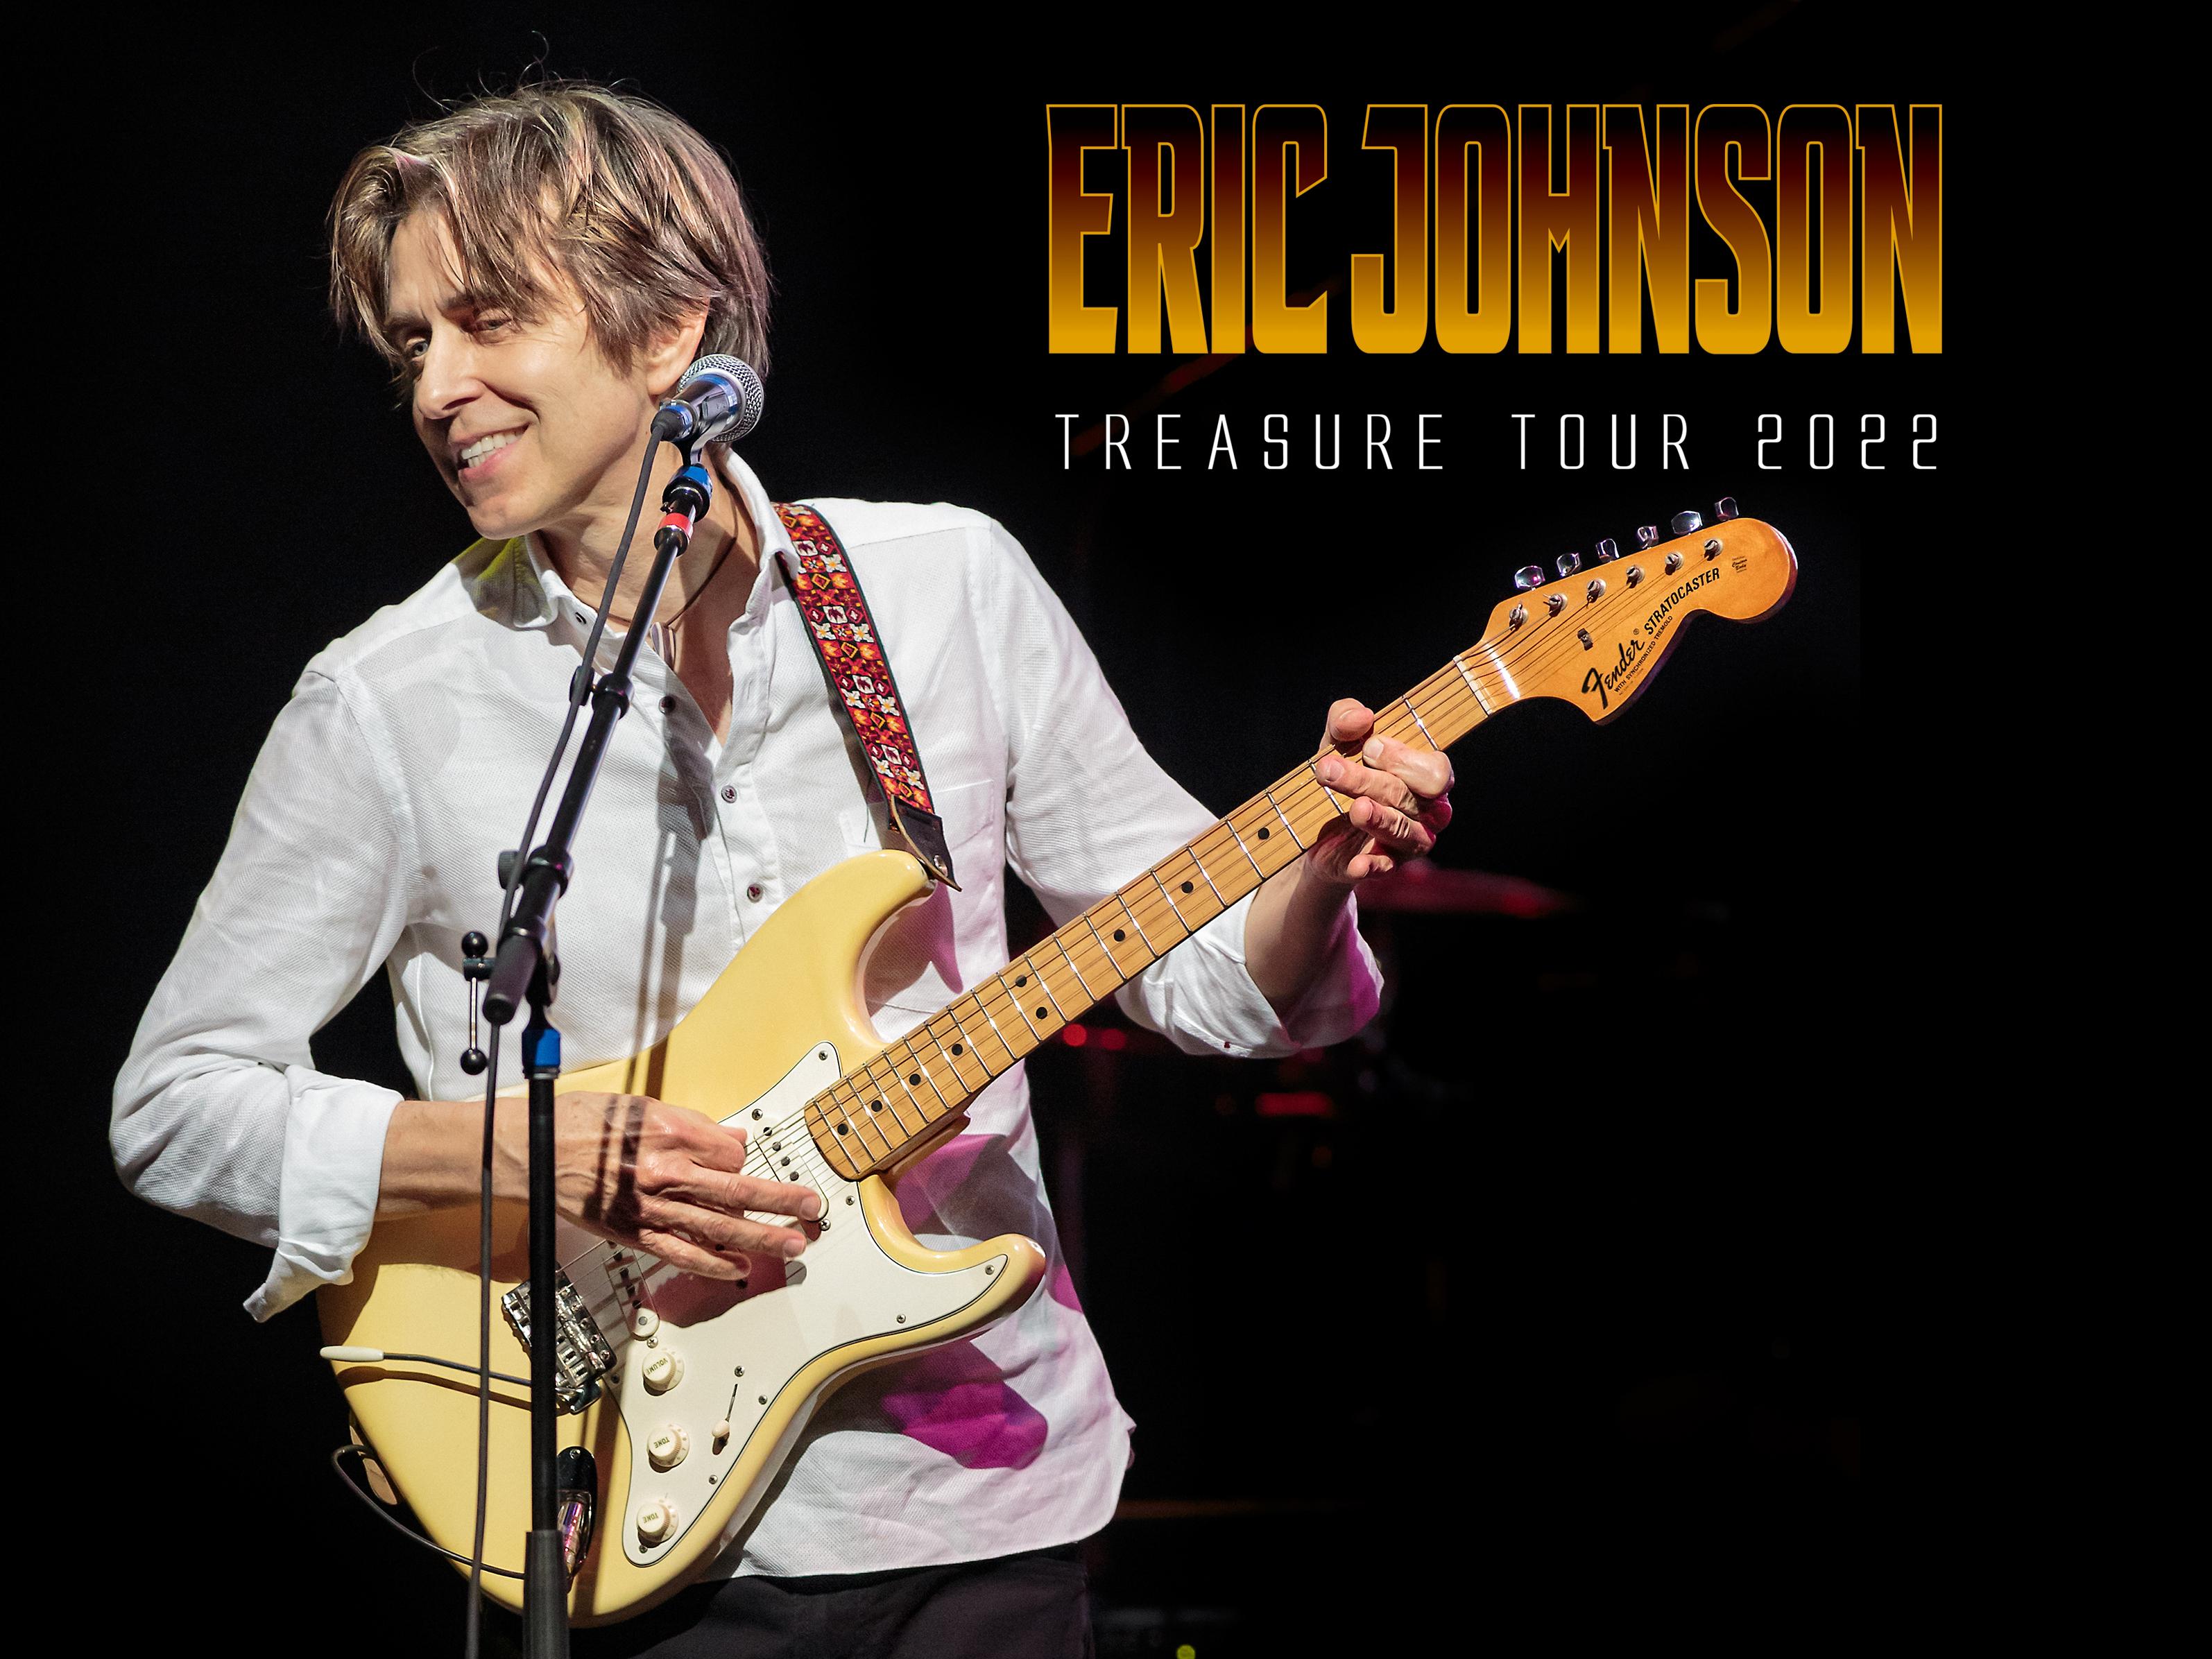 Eric Johnson: